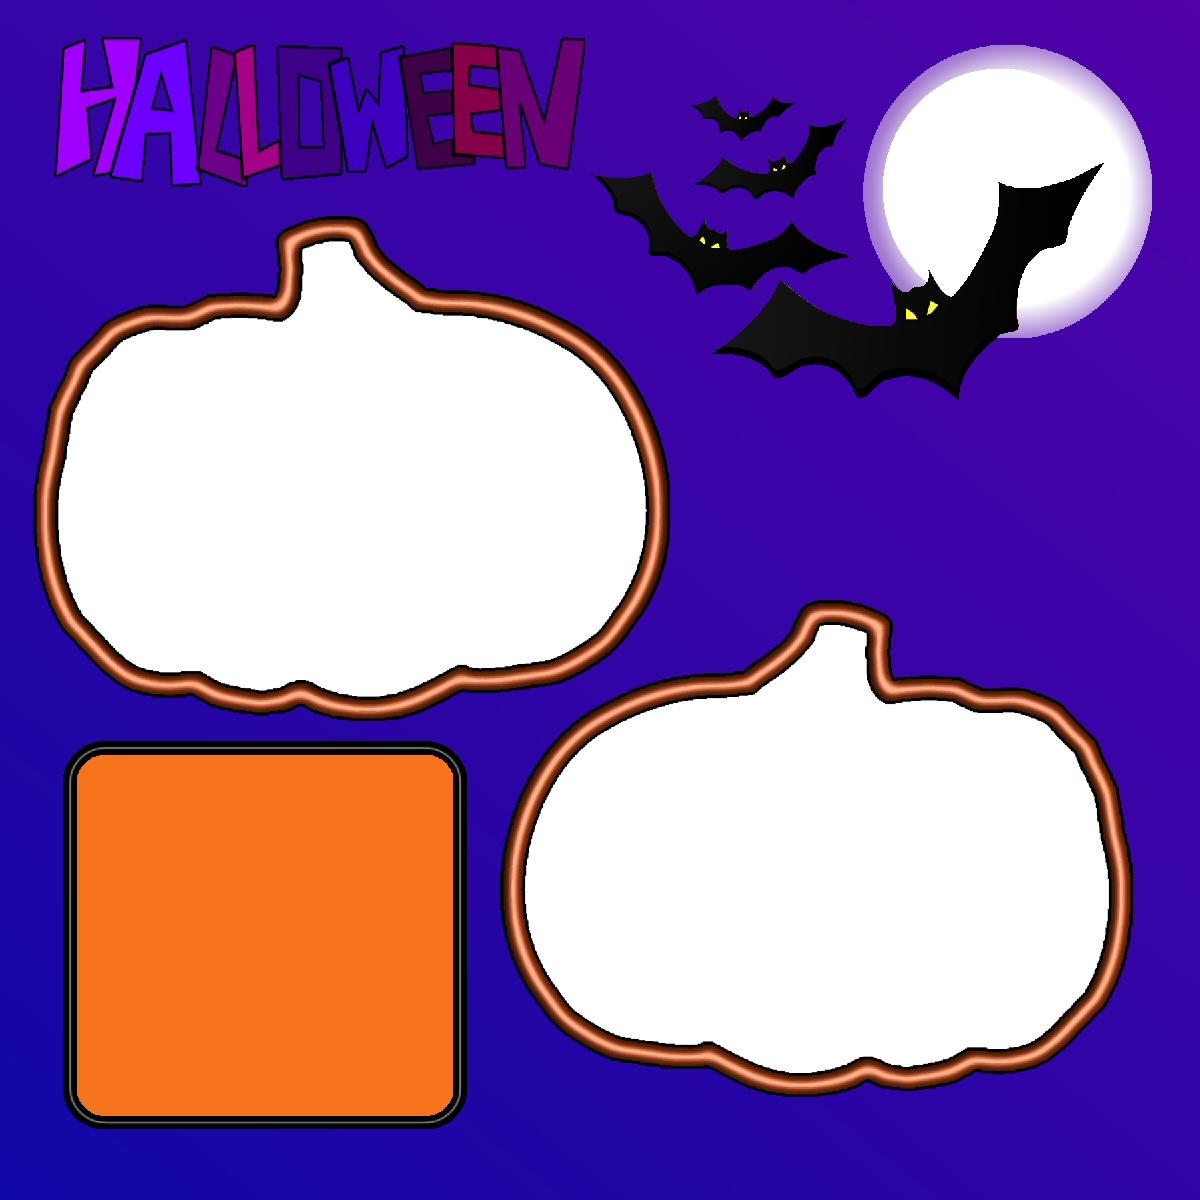 8x8_halloween_full